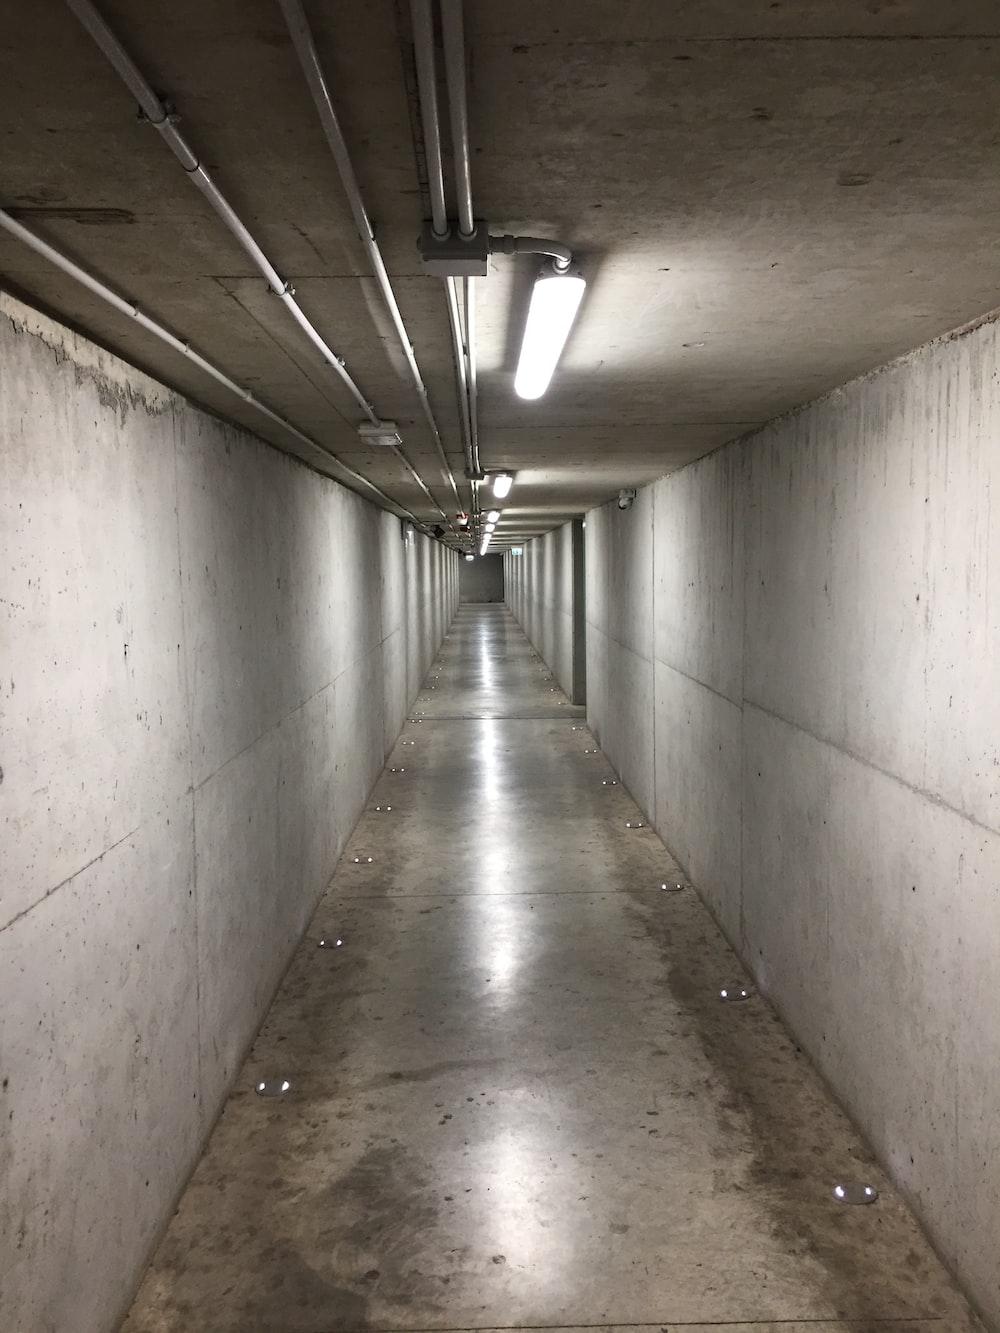 turned-on lights in hallway